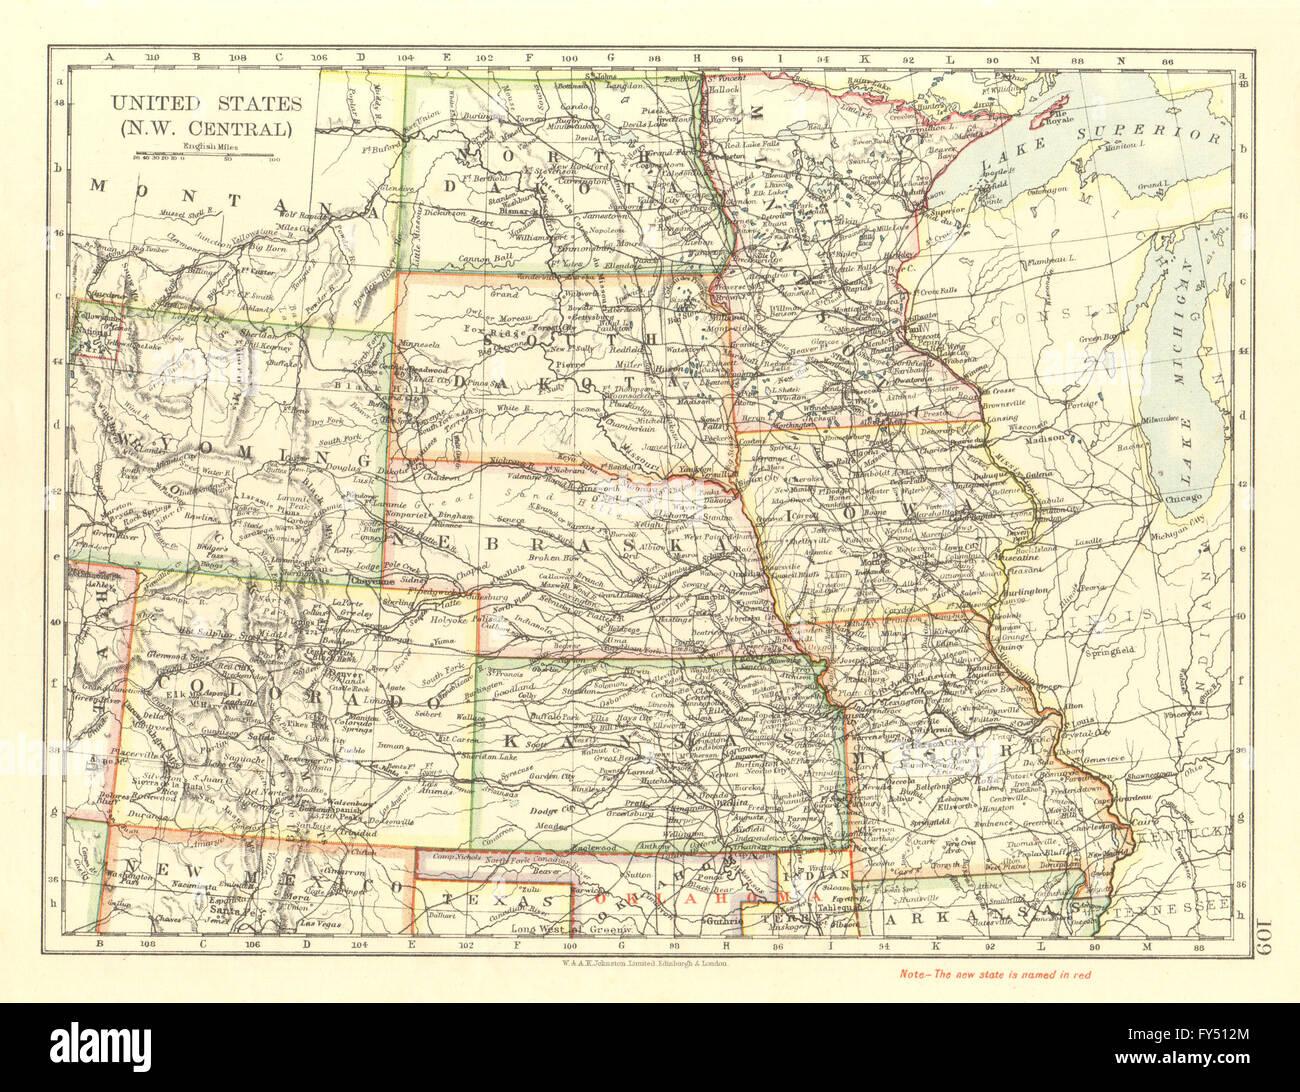 USA PLAINS STATES. Iowa Minnesota Kansas NE ND SD Colorado. JOHNSTON ...